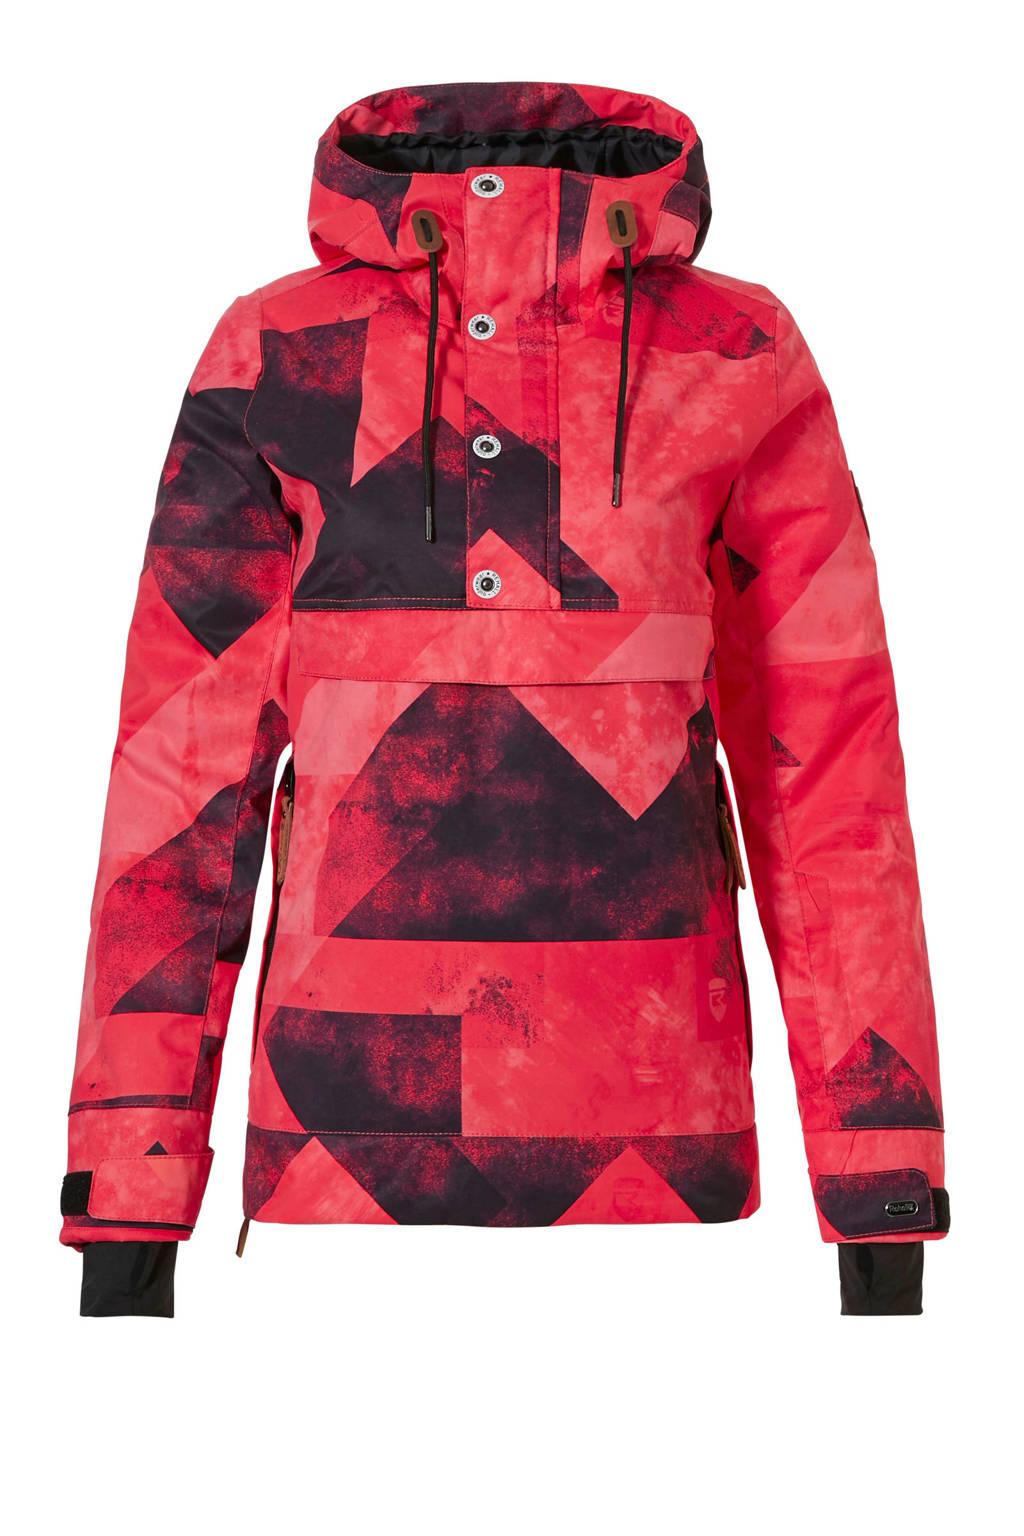 Rehall jack Frida-R rood/roze/zwart, Rood/roze/zwart